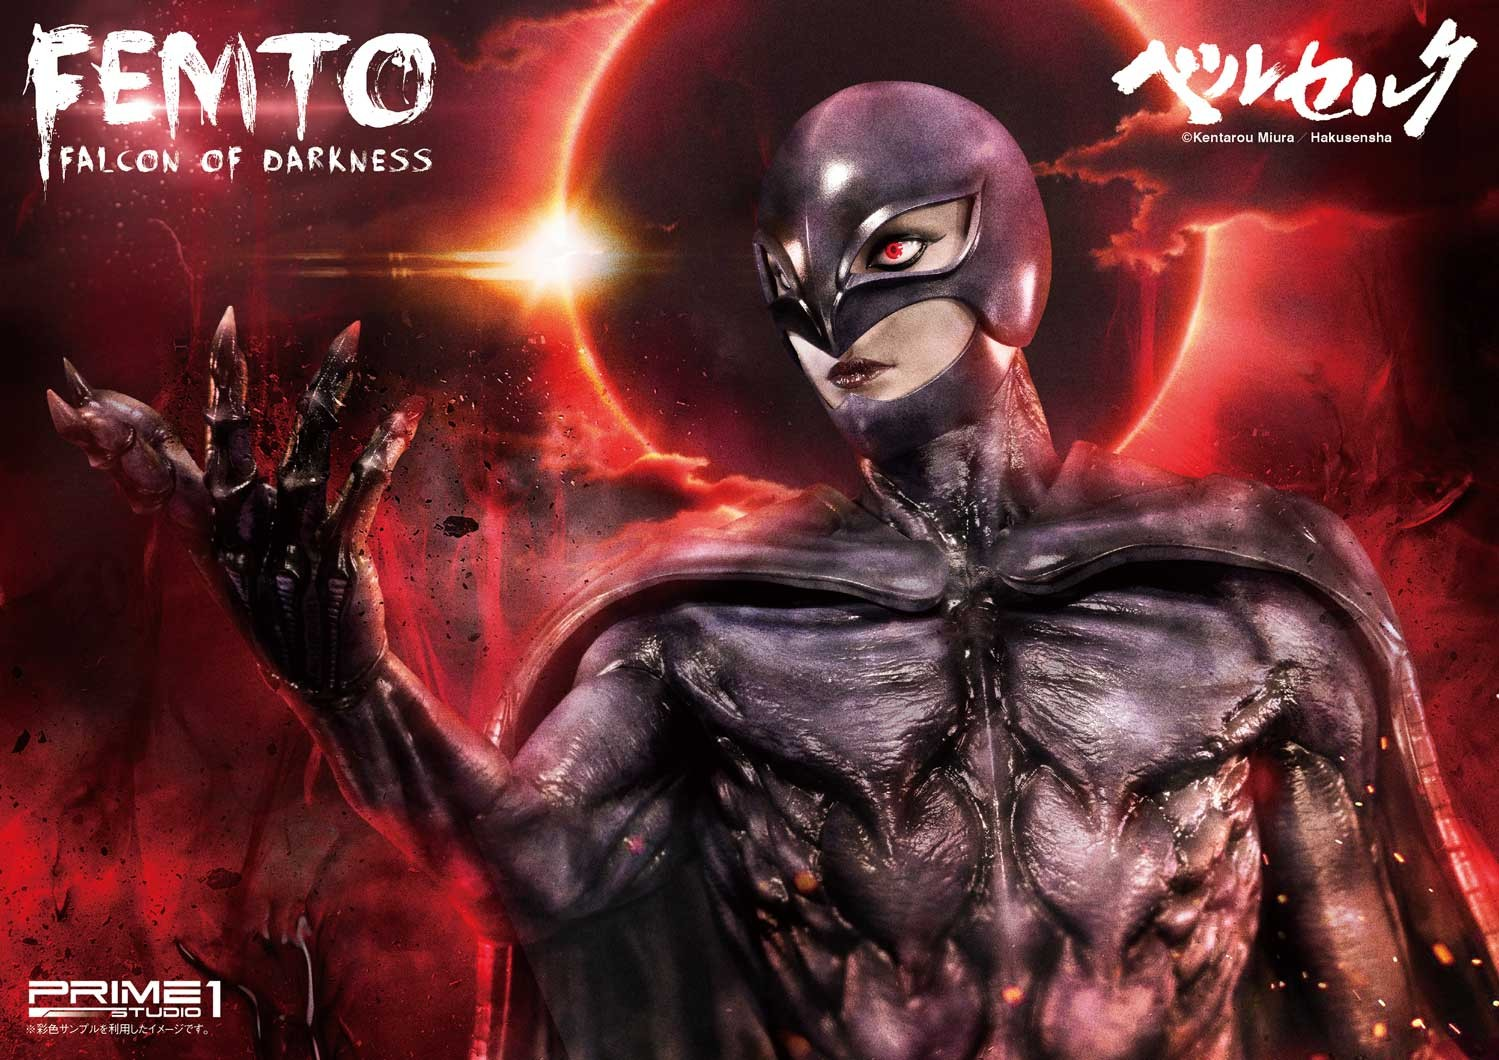 Link a Berserk Femto Falcon of Darkness Ultimate Premium Masterline Prime 1 Studio Itakon.it 09